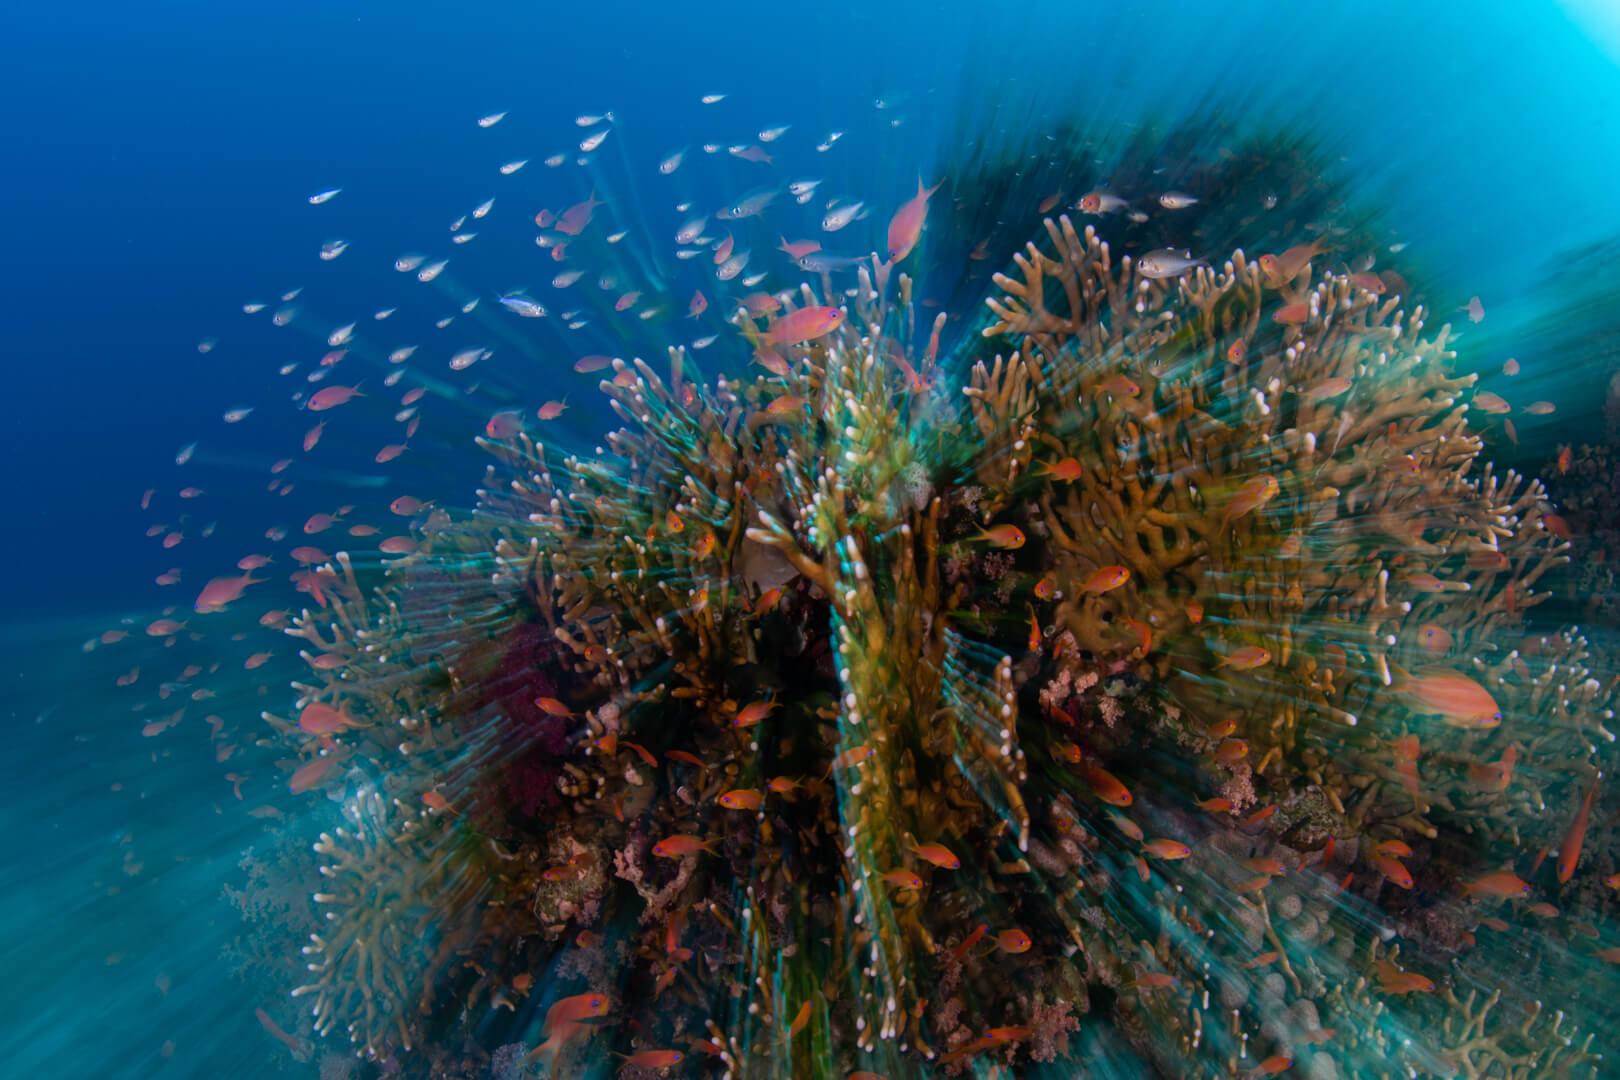 Scuba Travel, Red Sea, Shark and Yolanda, soft corals, Wrecks and Reefs